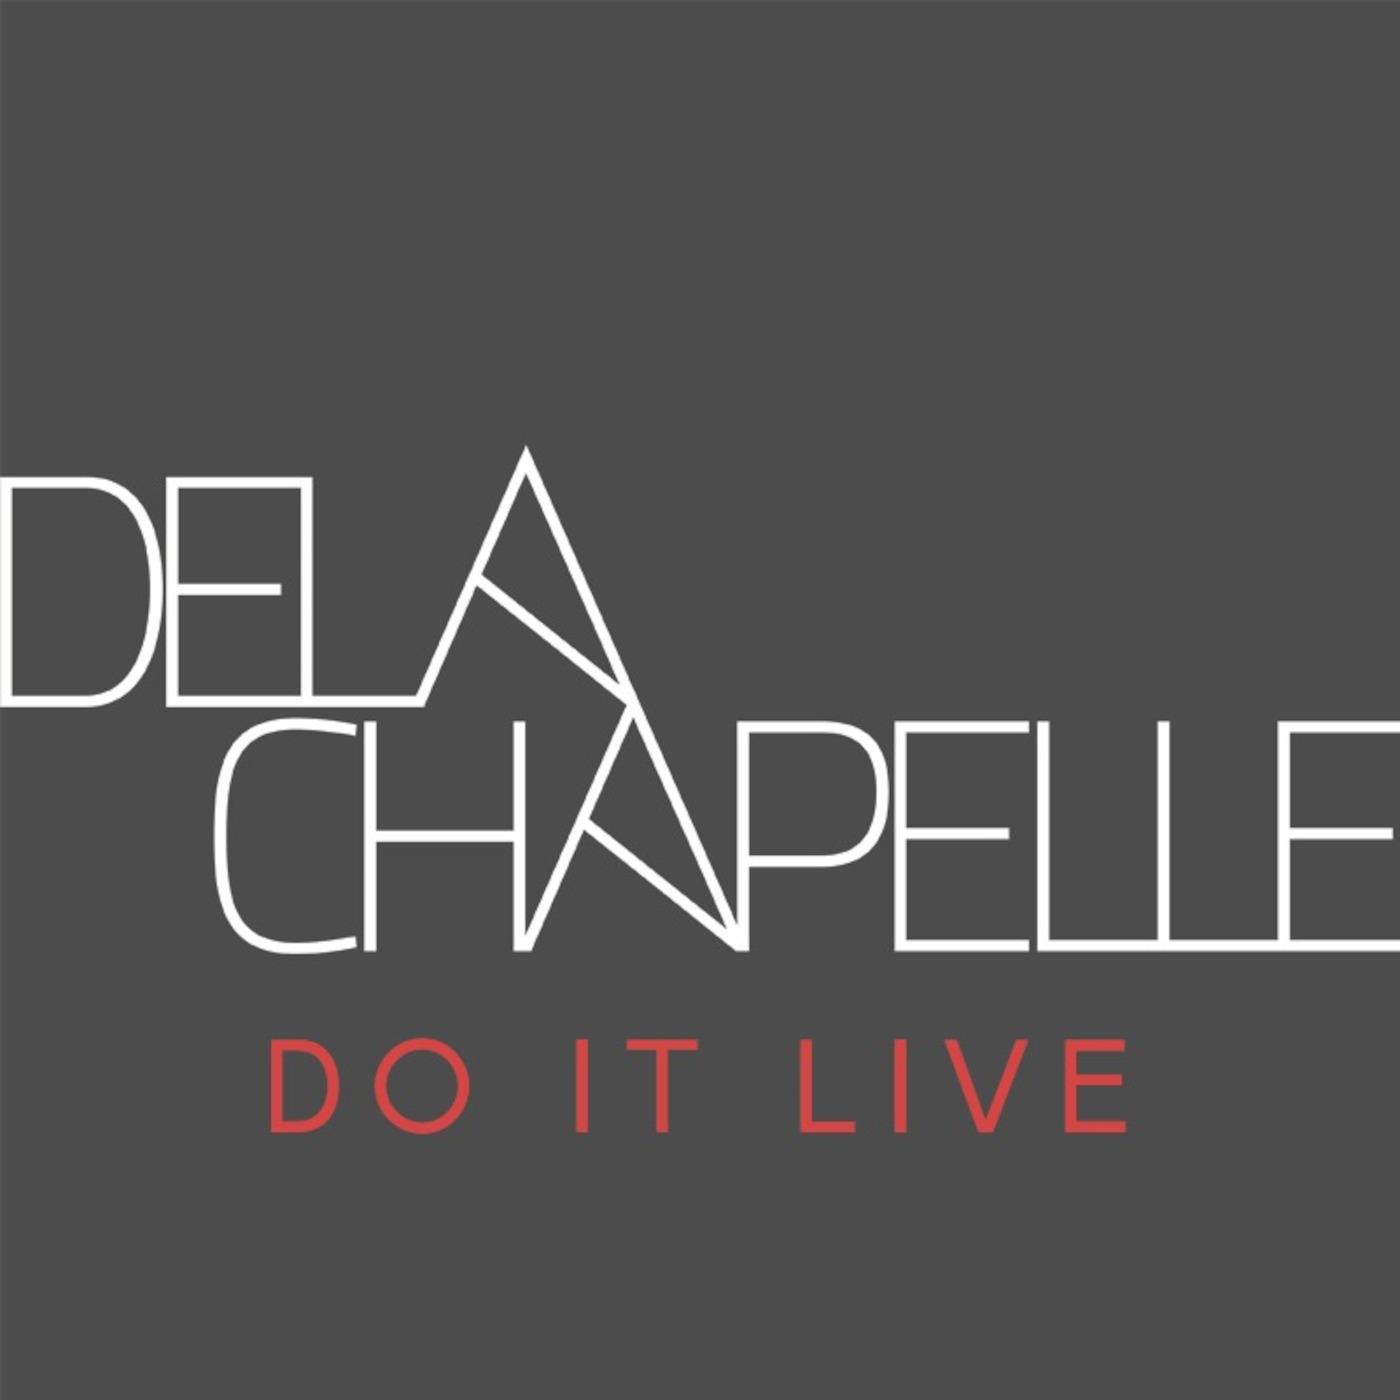 delaChapelle